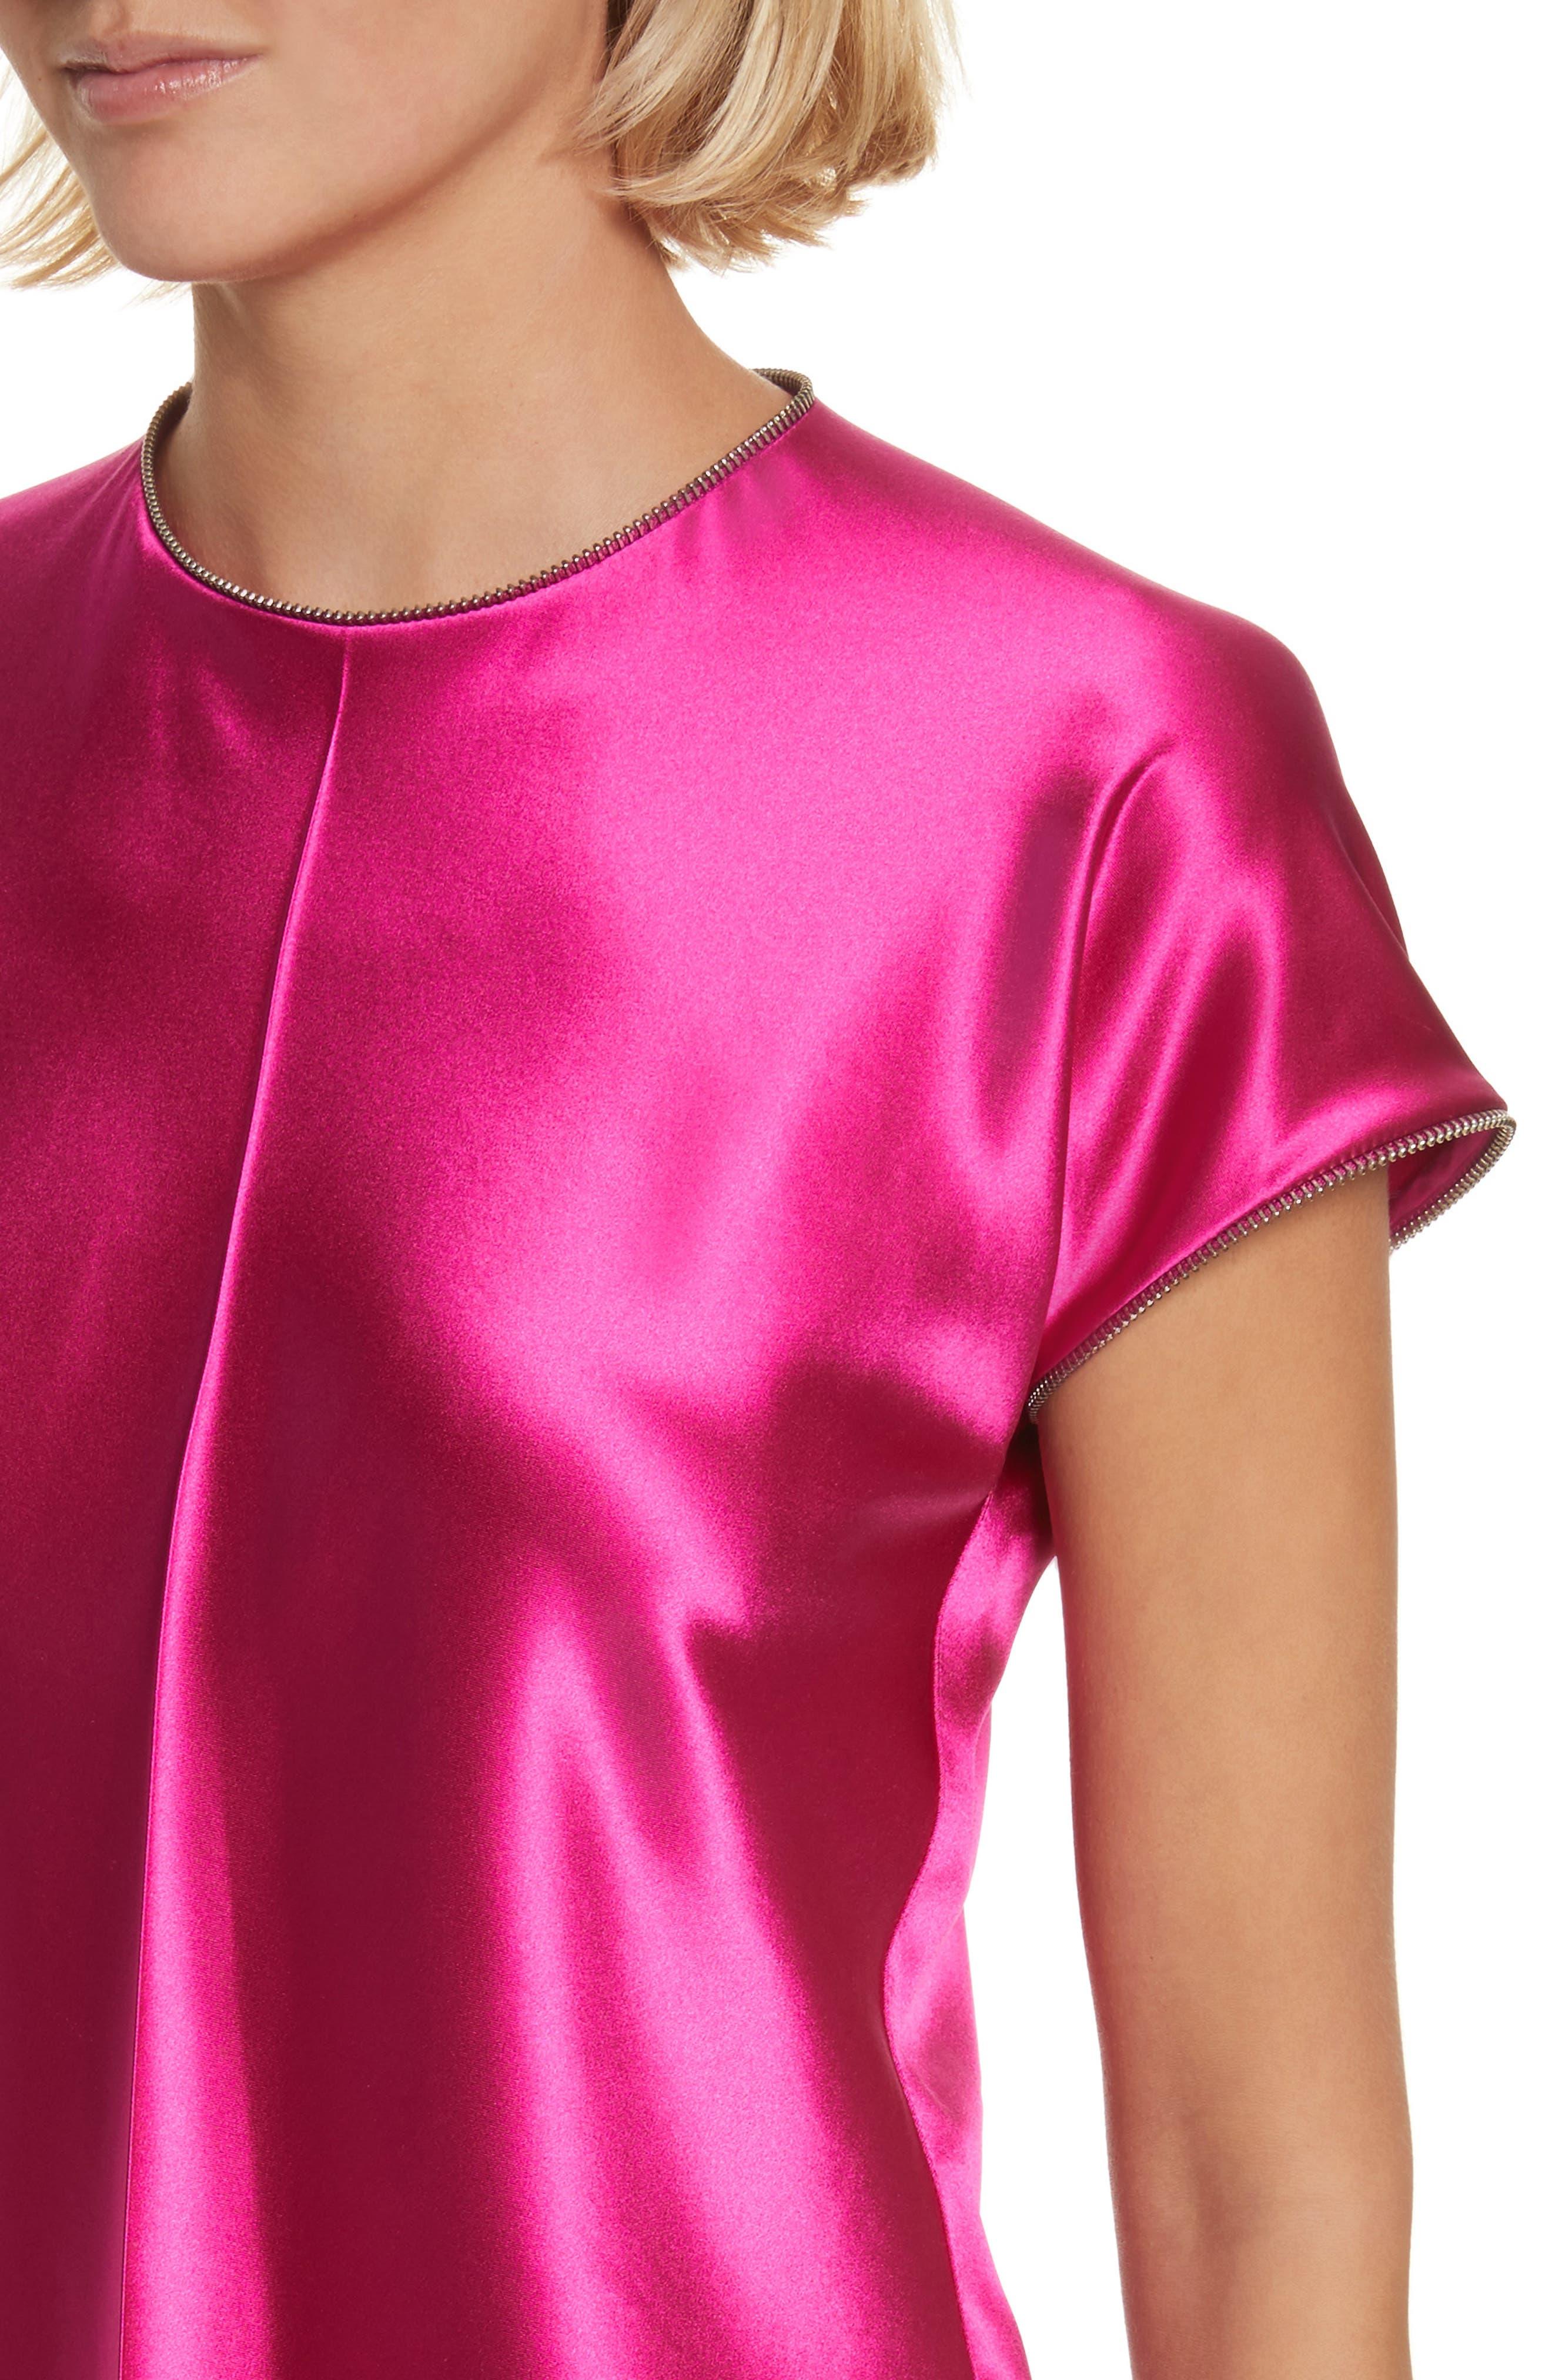 Zipper Detail Lacquered Silk Top,                             Alternate thumbnail 4, color,                             655